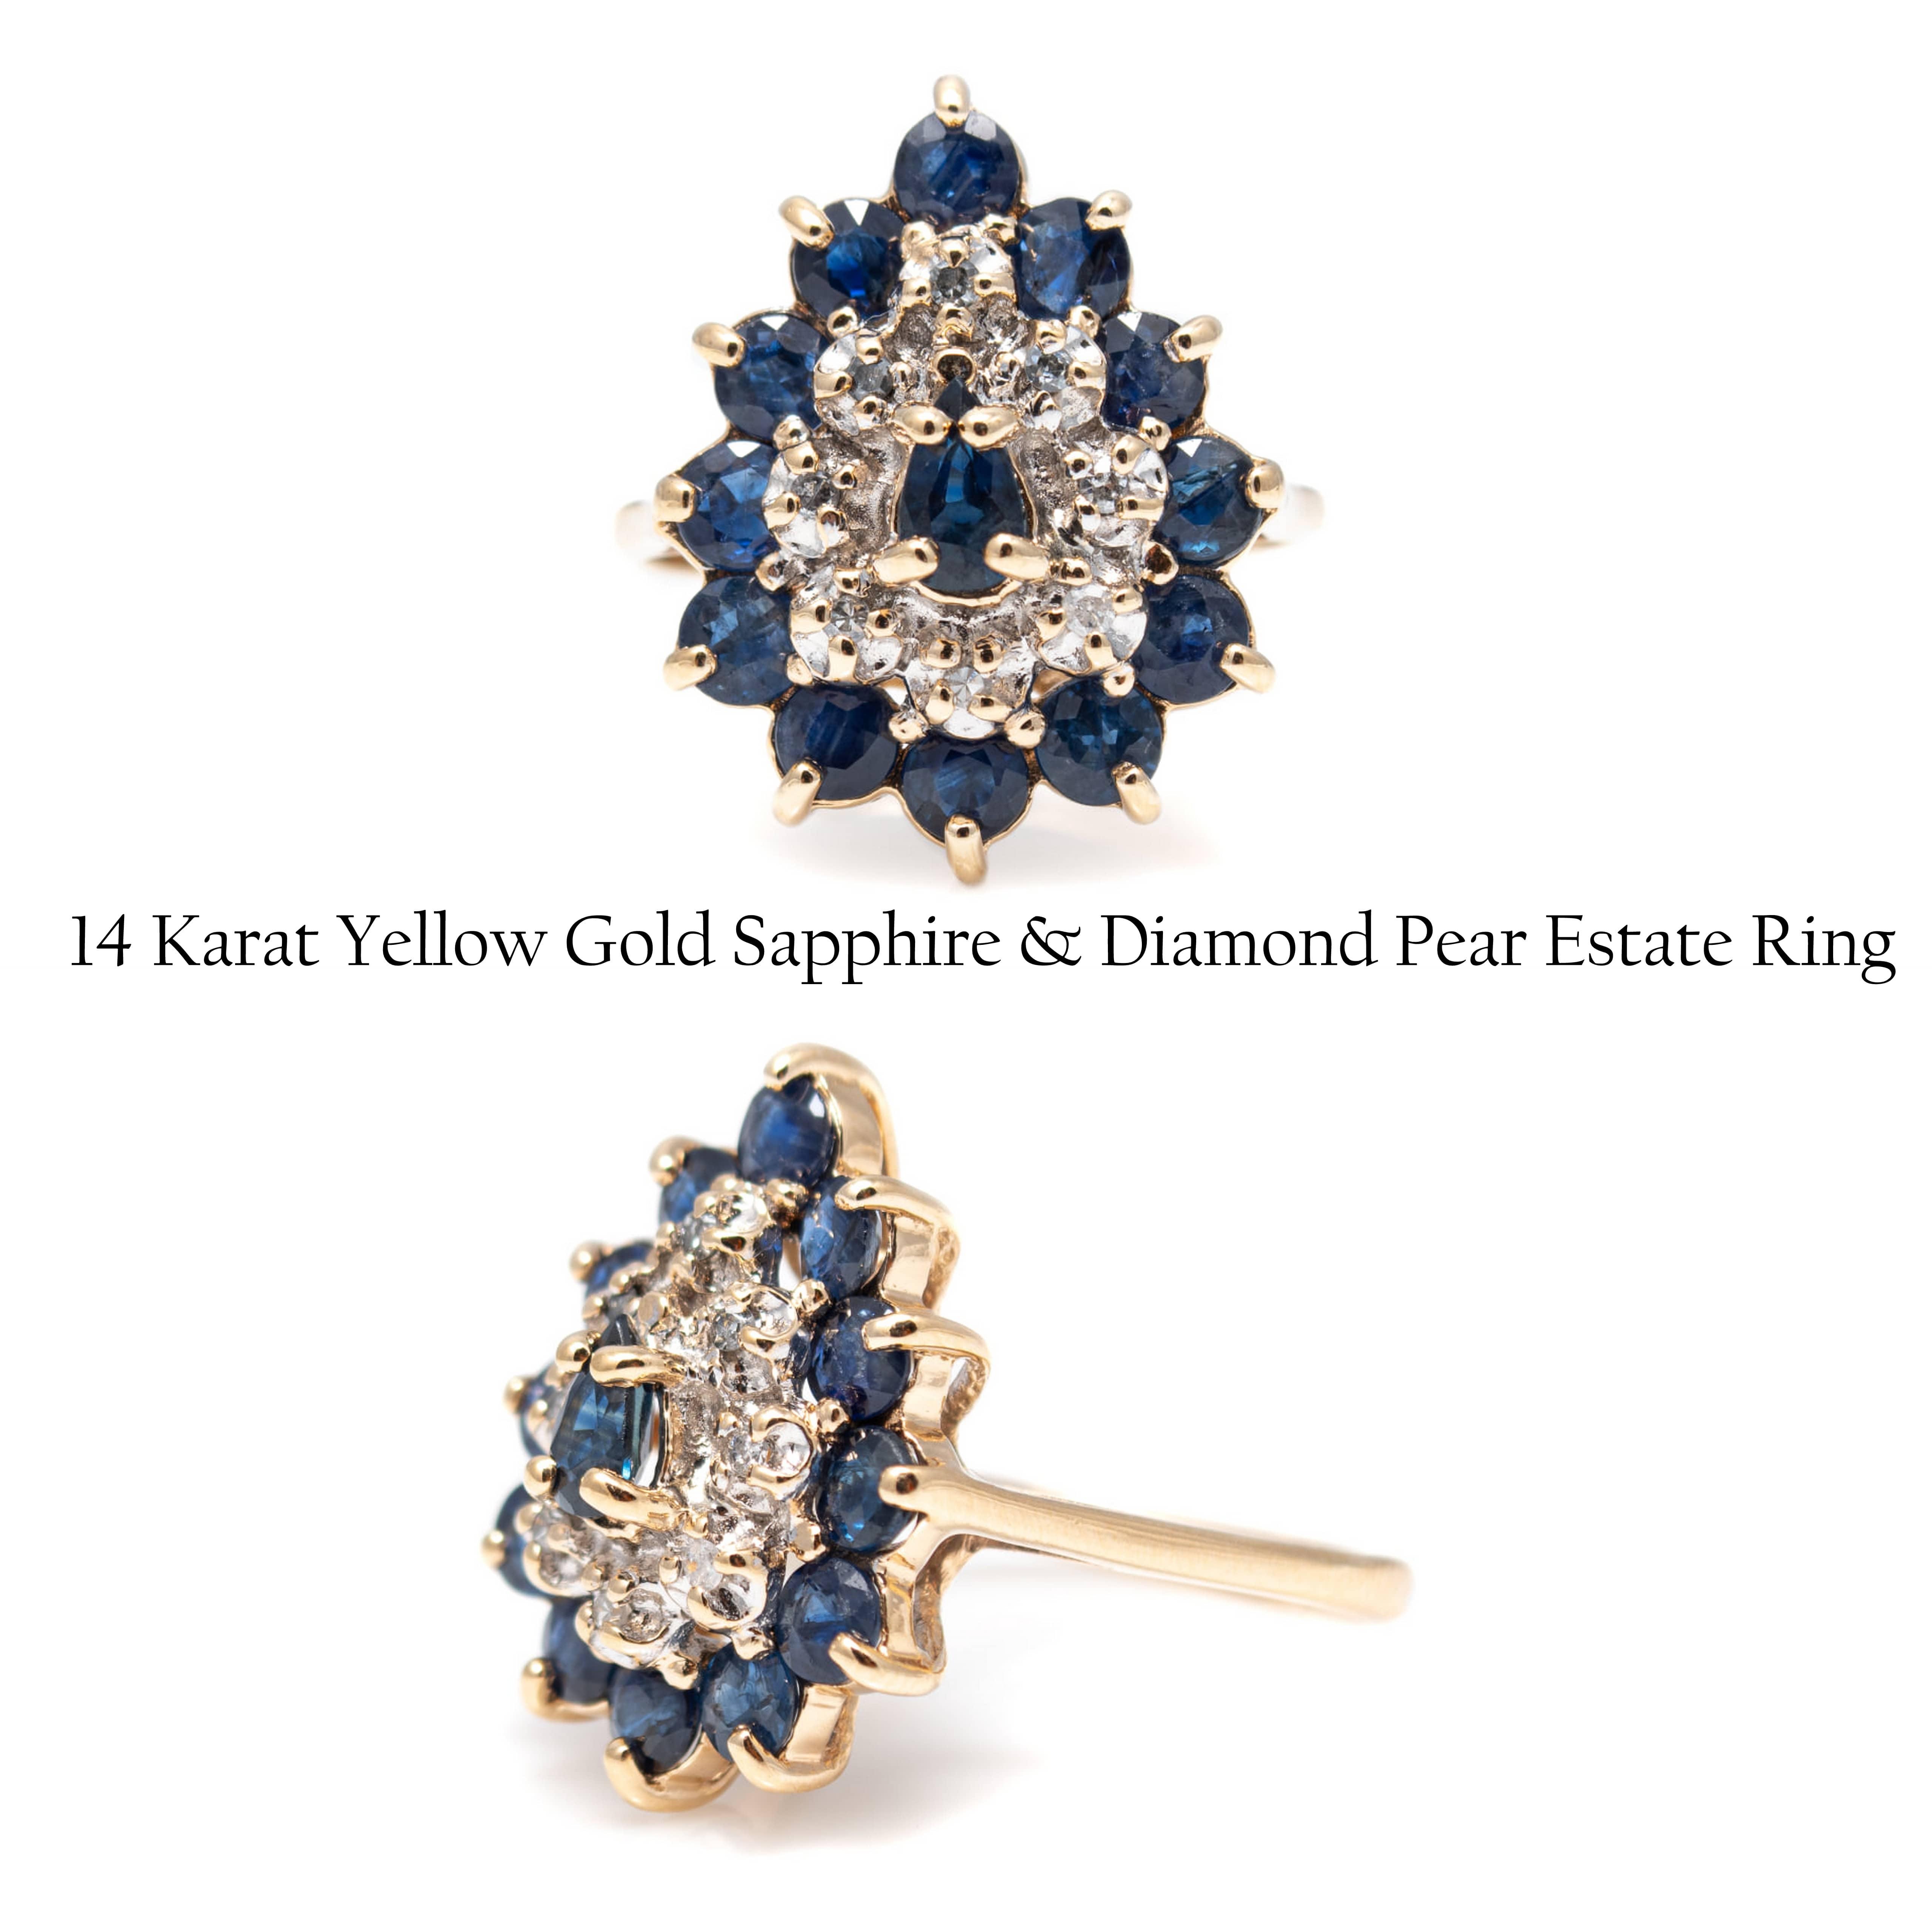 14 Karat Yellow Gold Sapphire & Diamond